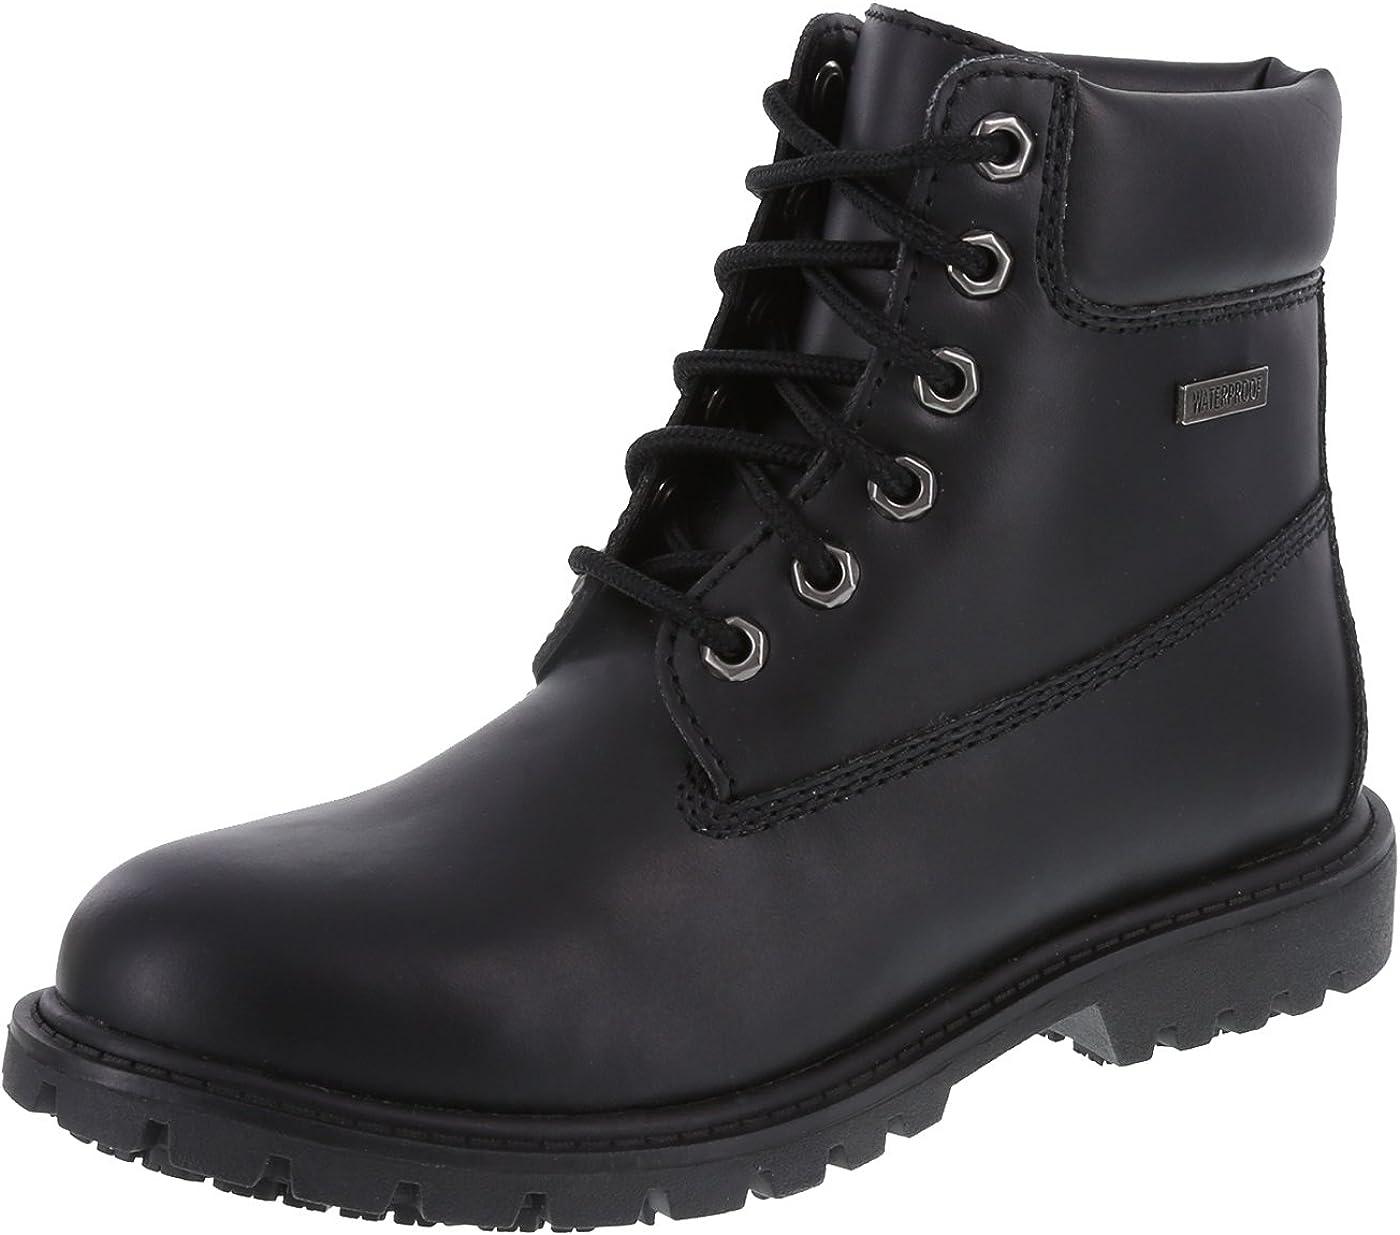 safeTstep Women's Slip-Resistant Antero Work Boot